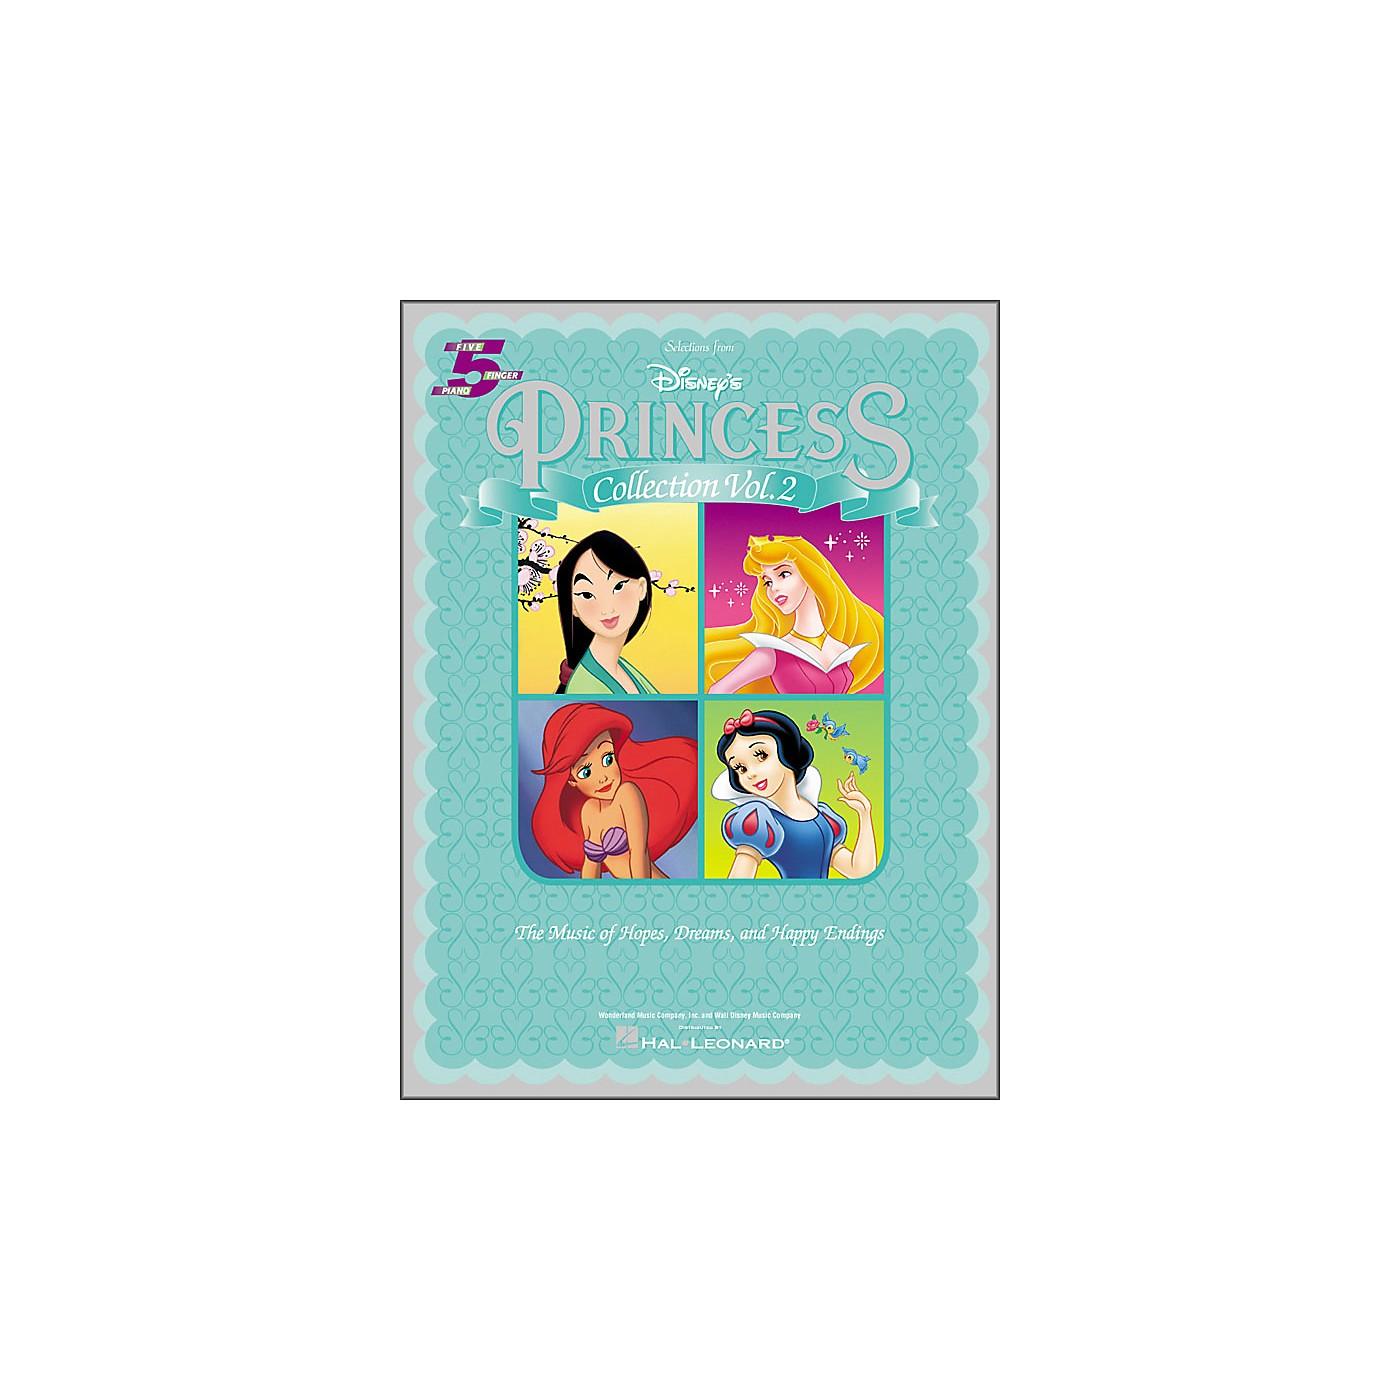 Hal Leonard Disney's Princess Collection Volume 2 for Five Finger Piano thumbnail